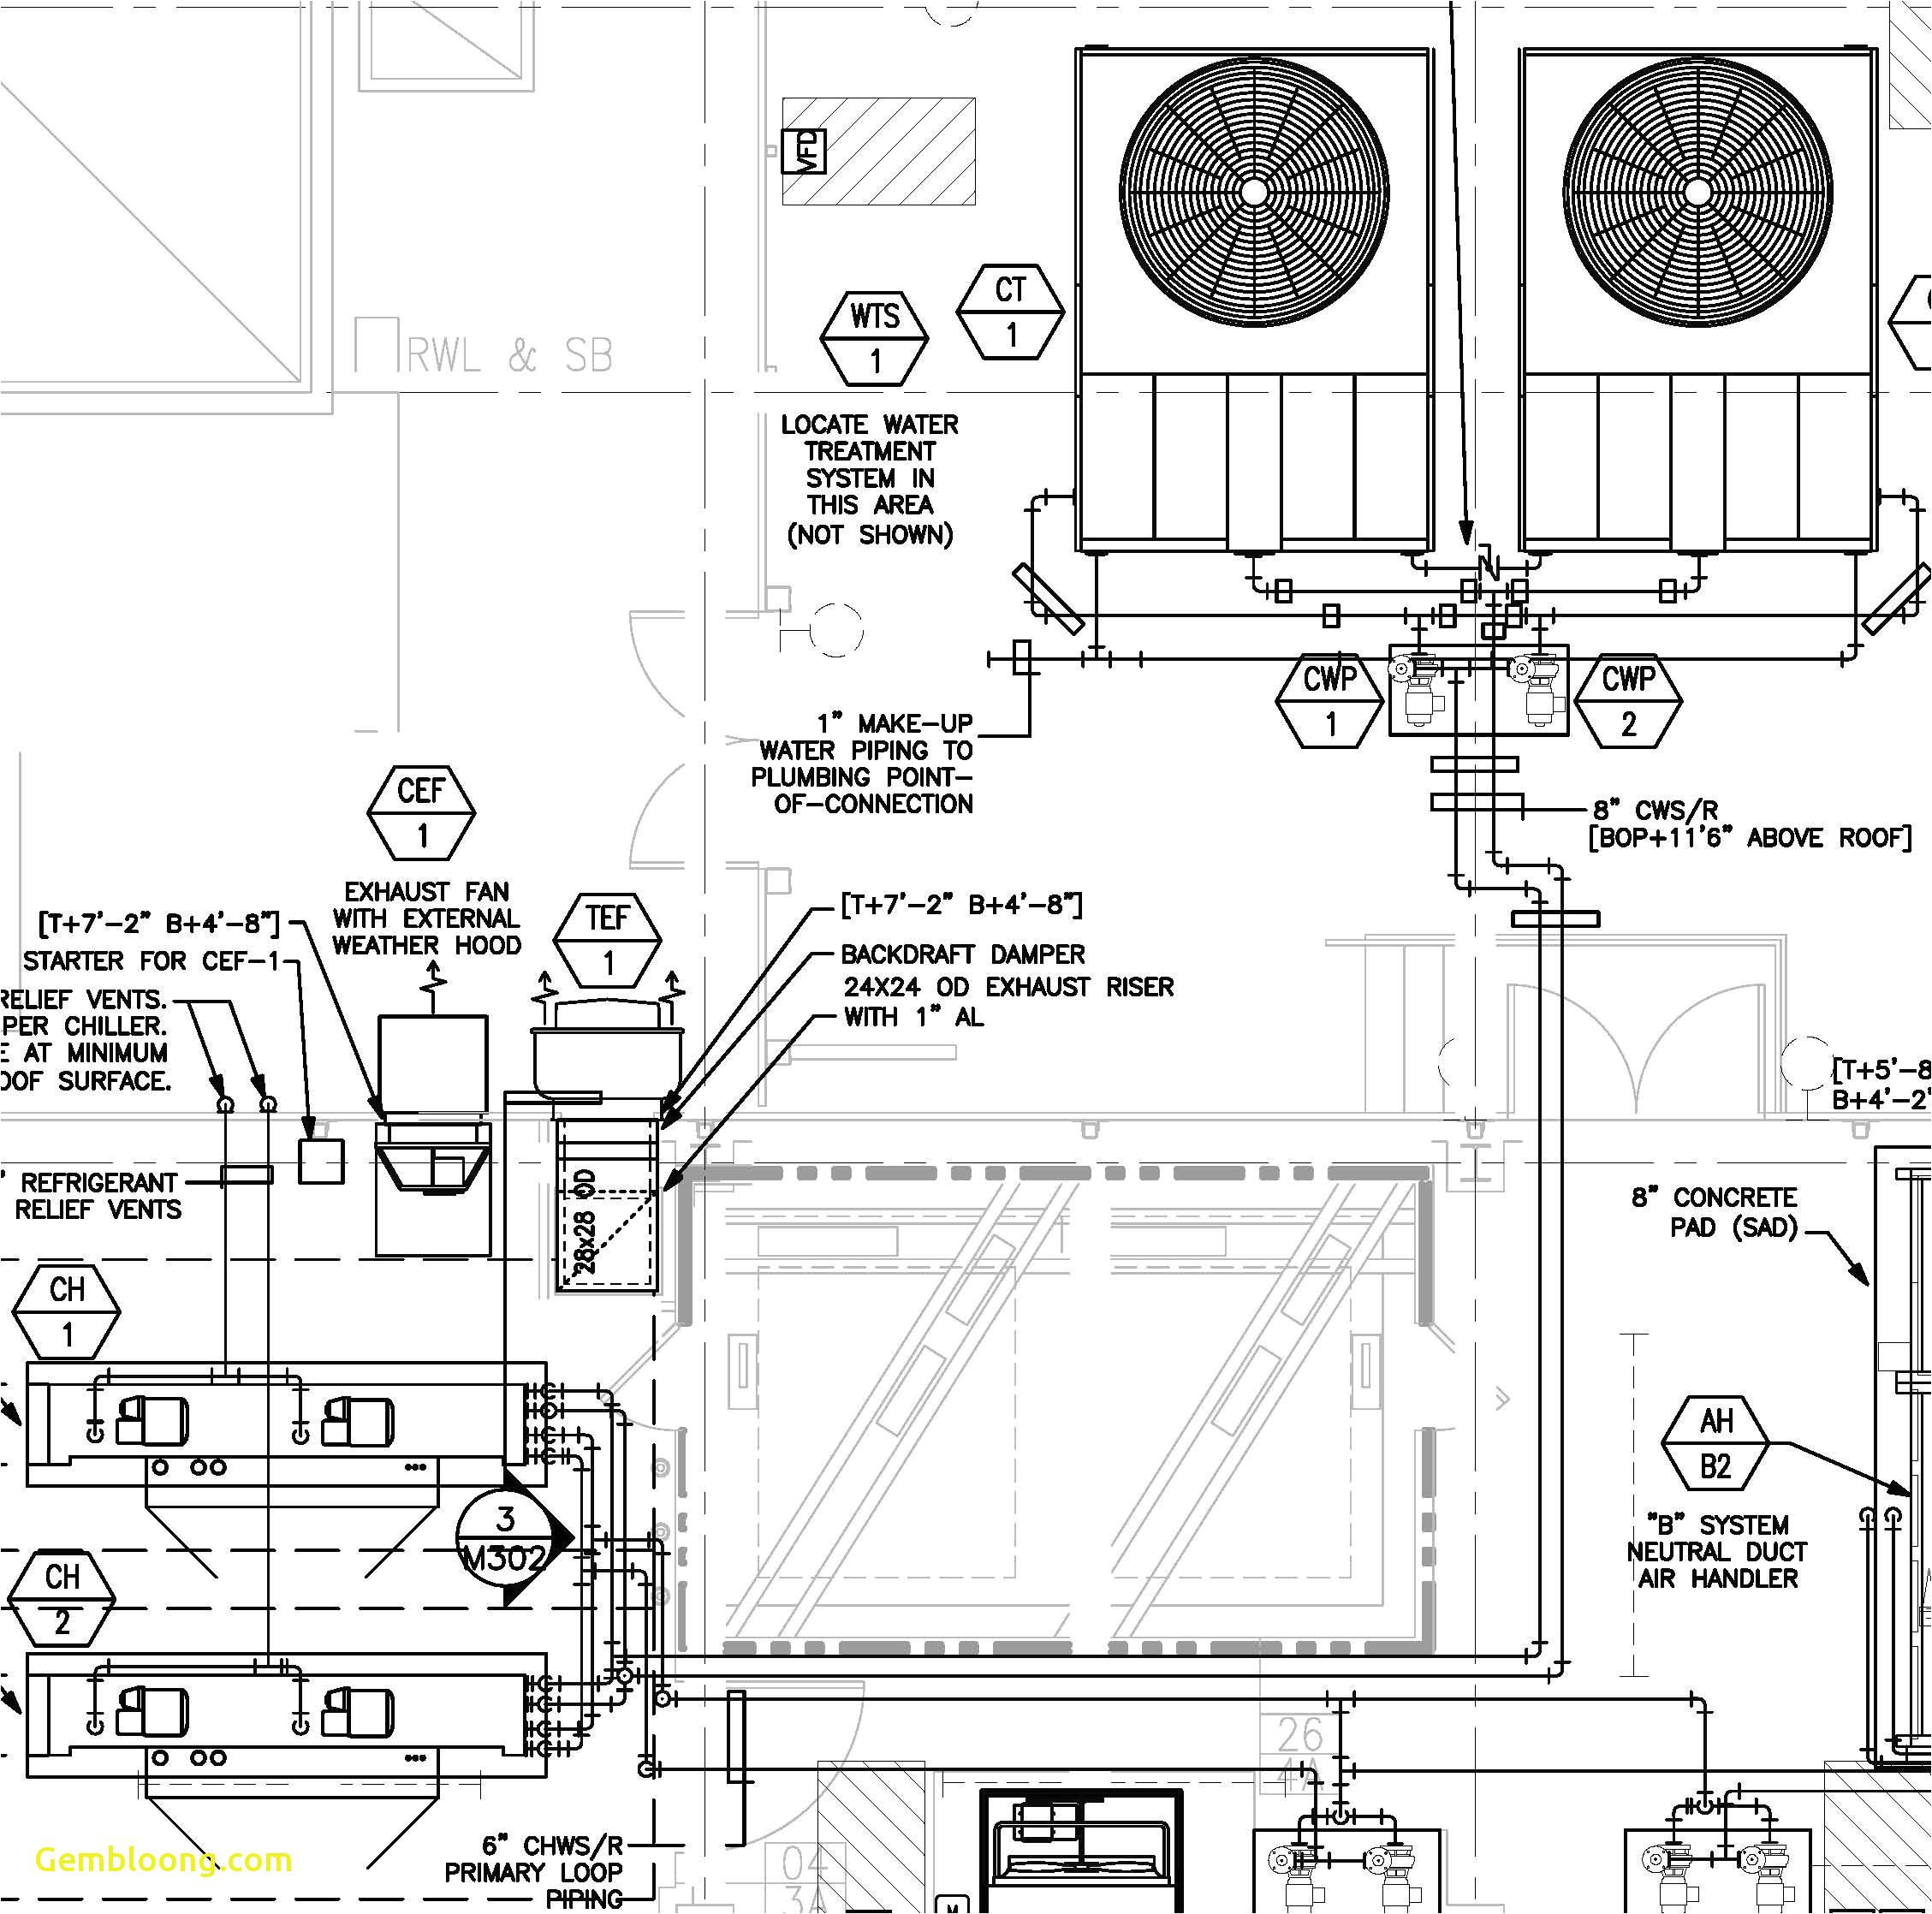 2002 honda accord thermostat housing fabulous muncie wiring diagram muncie pto wiring diagram 2002 honda accord